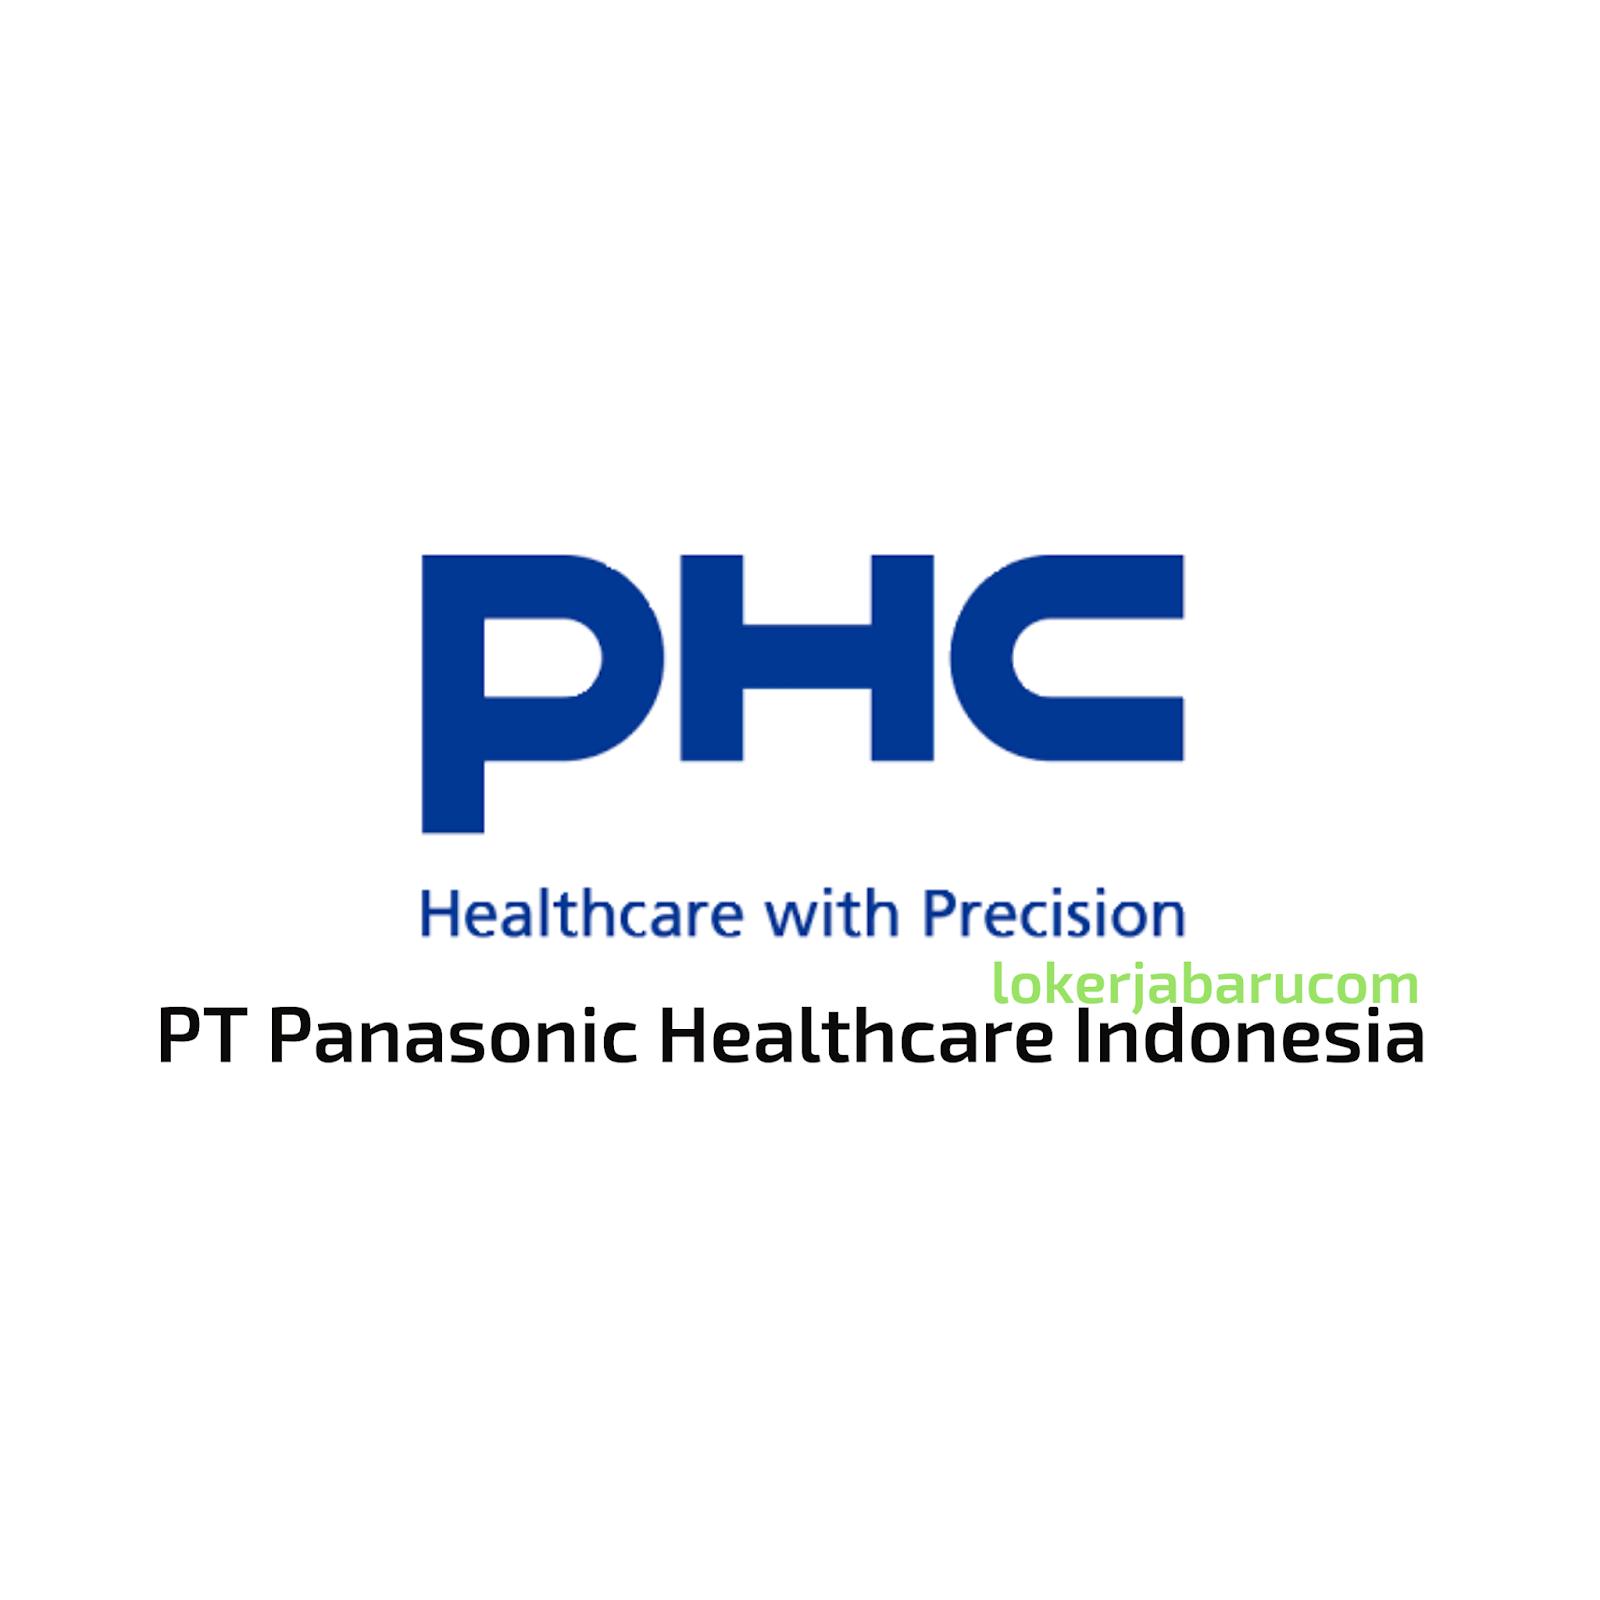 Pt Panasonic Healthcare Indonesia